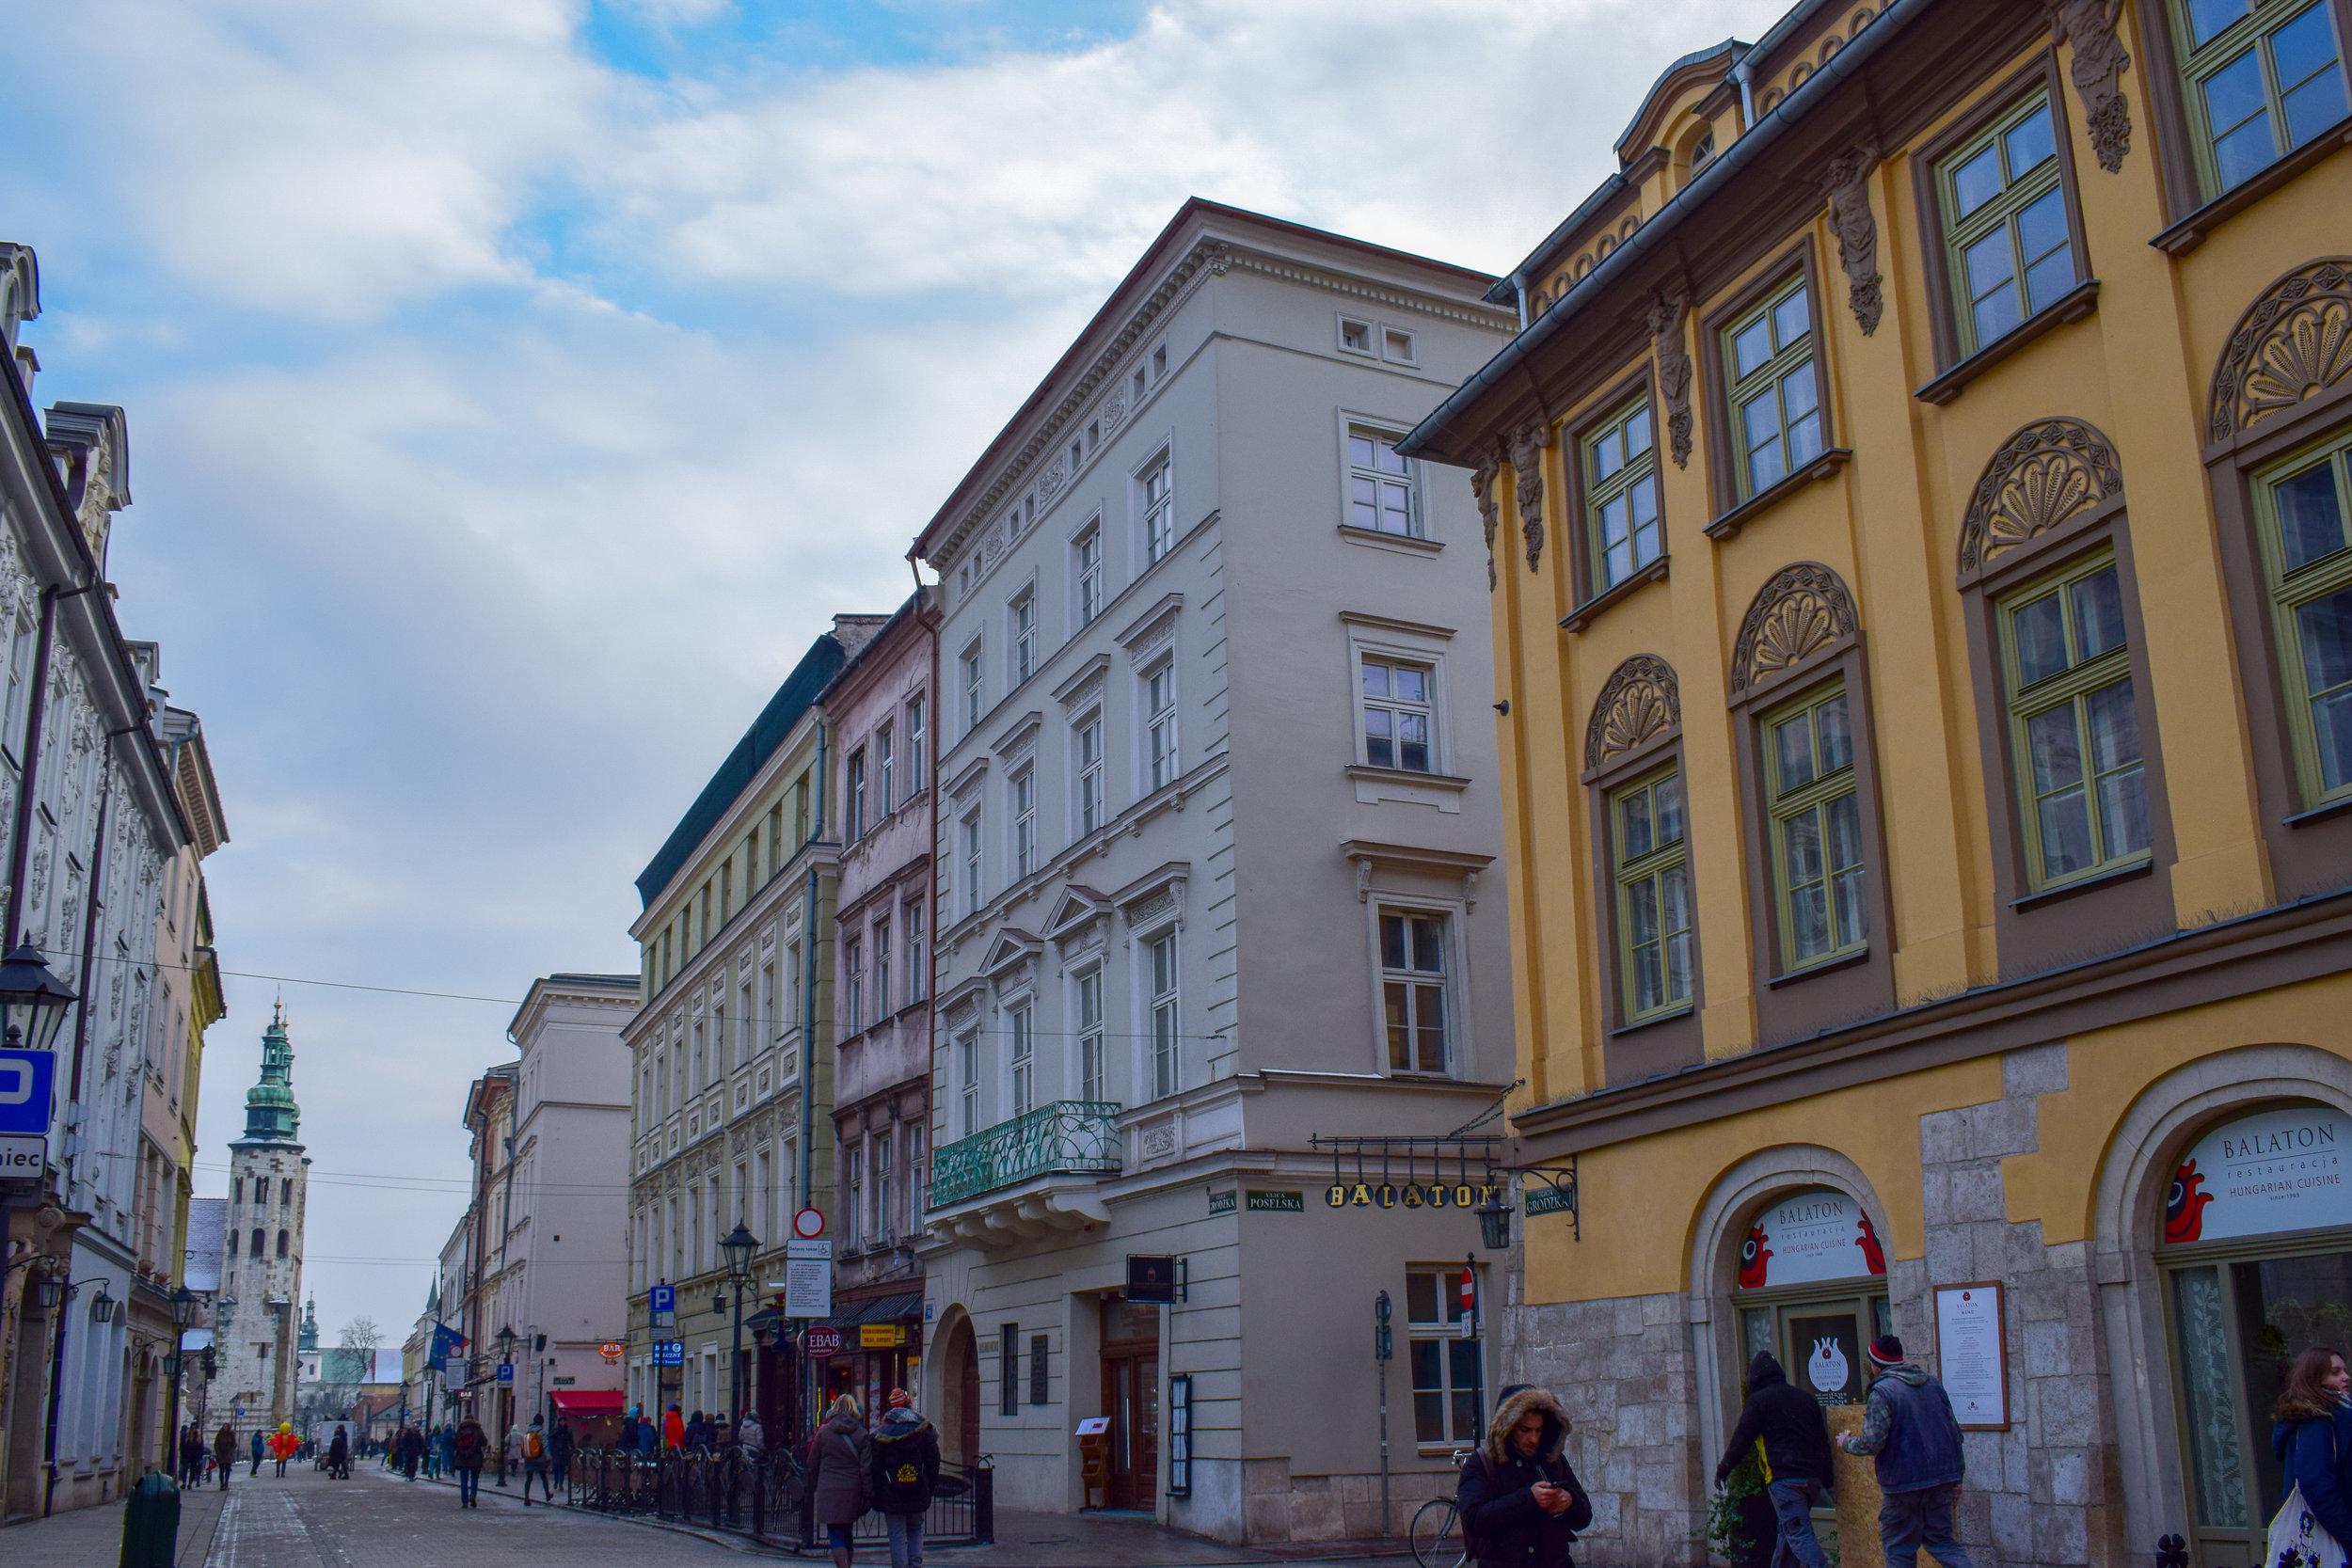 A colourful street in Krakow.